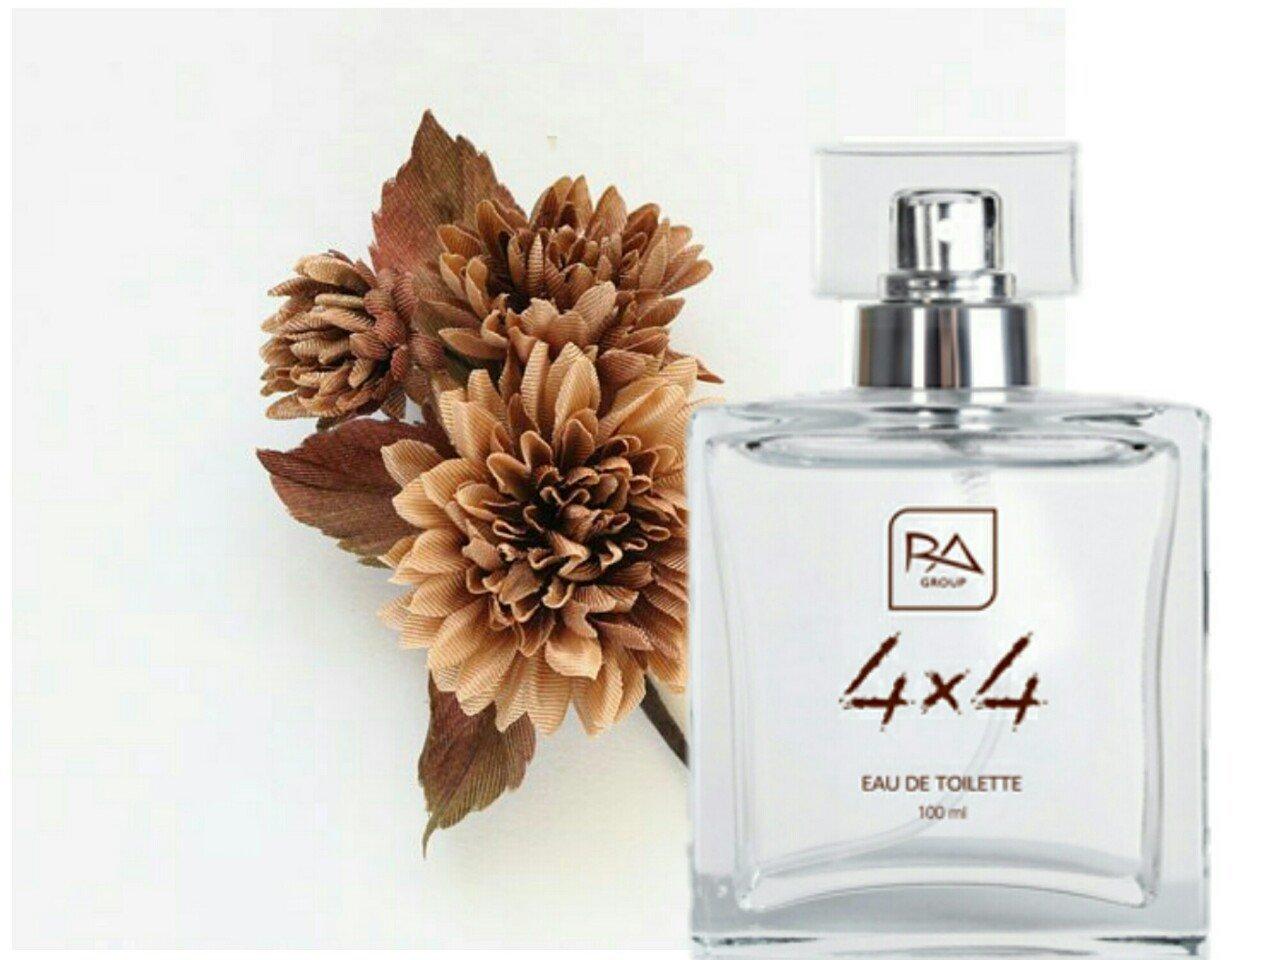 Feromoner! Quality Perfume EdT 4x4 100 ml RaGroup (413955951